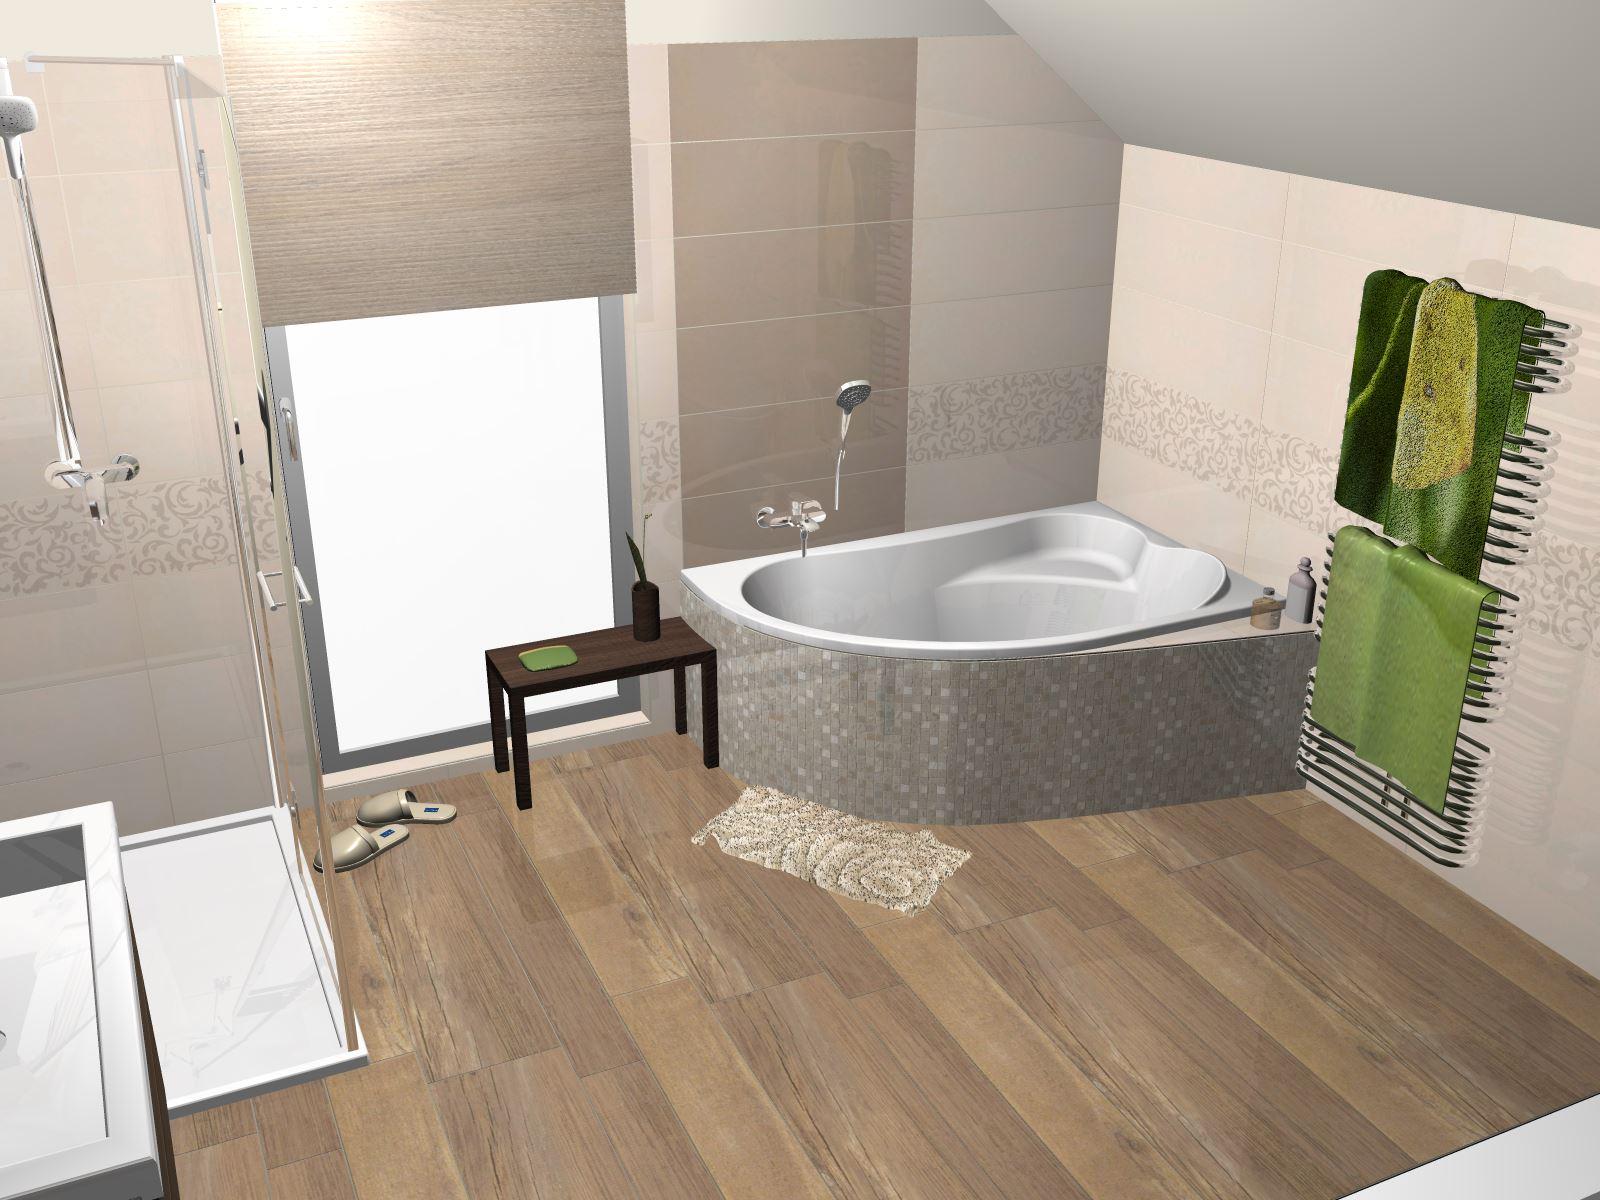 supergres melody bathroom by pirman romana trgocev d o o on visoft360 portal. Black Bedroom Furniture Sets. Home Design Ideas